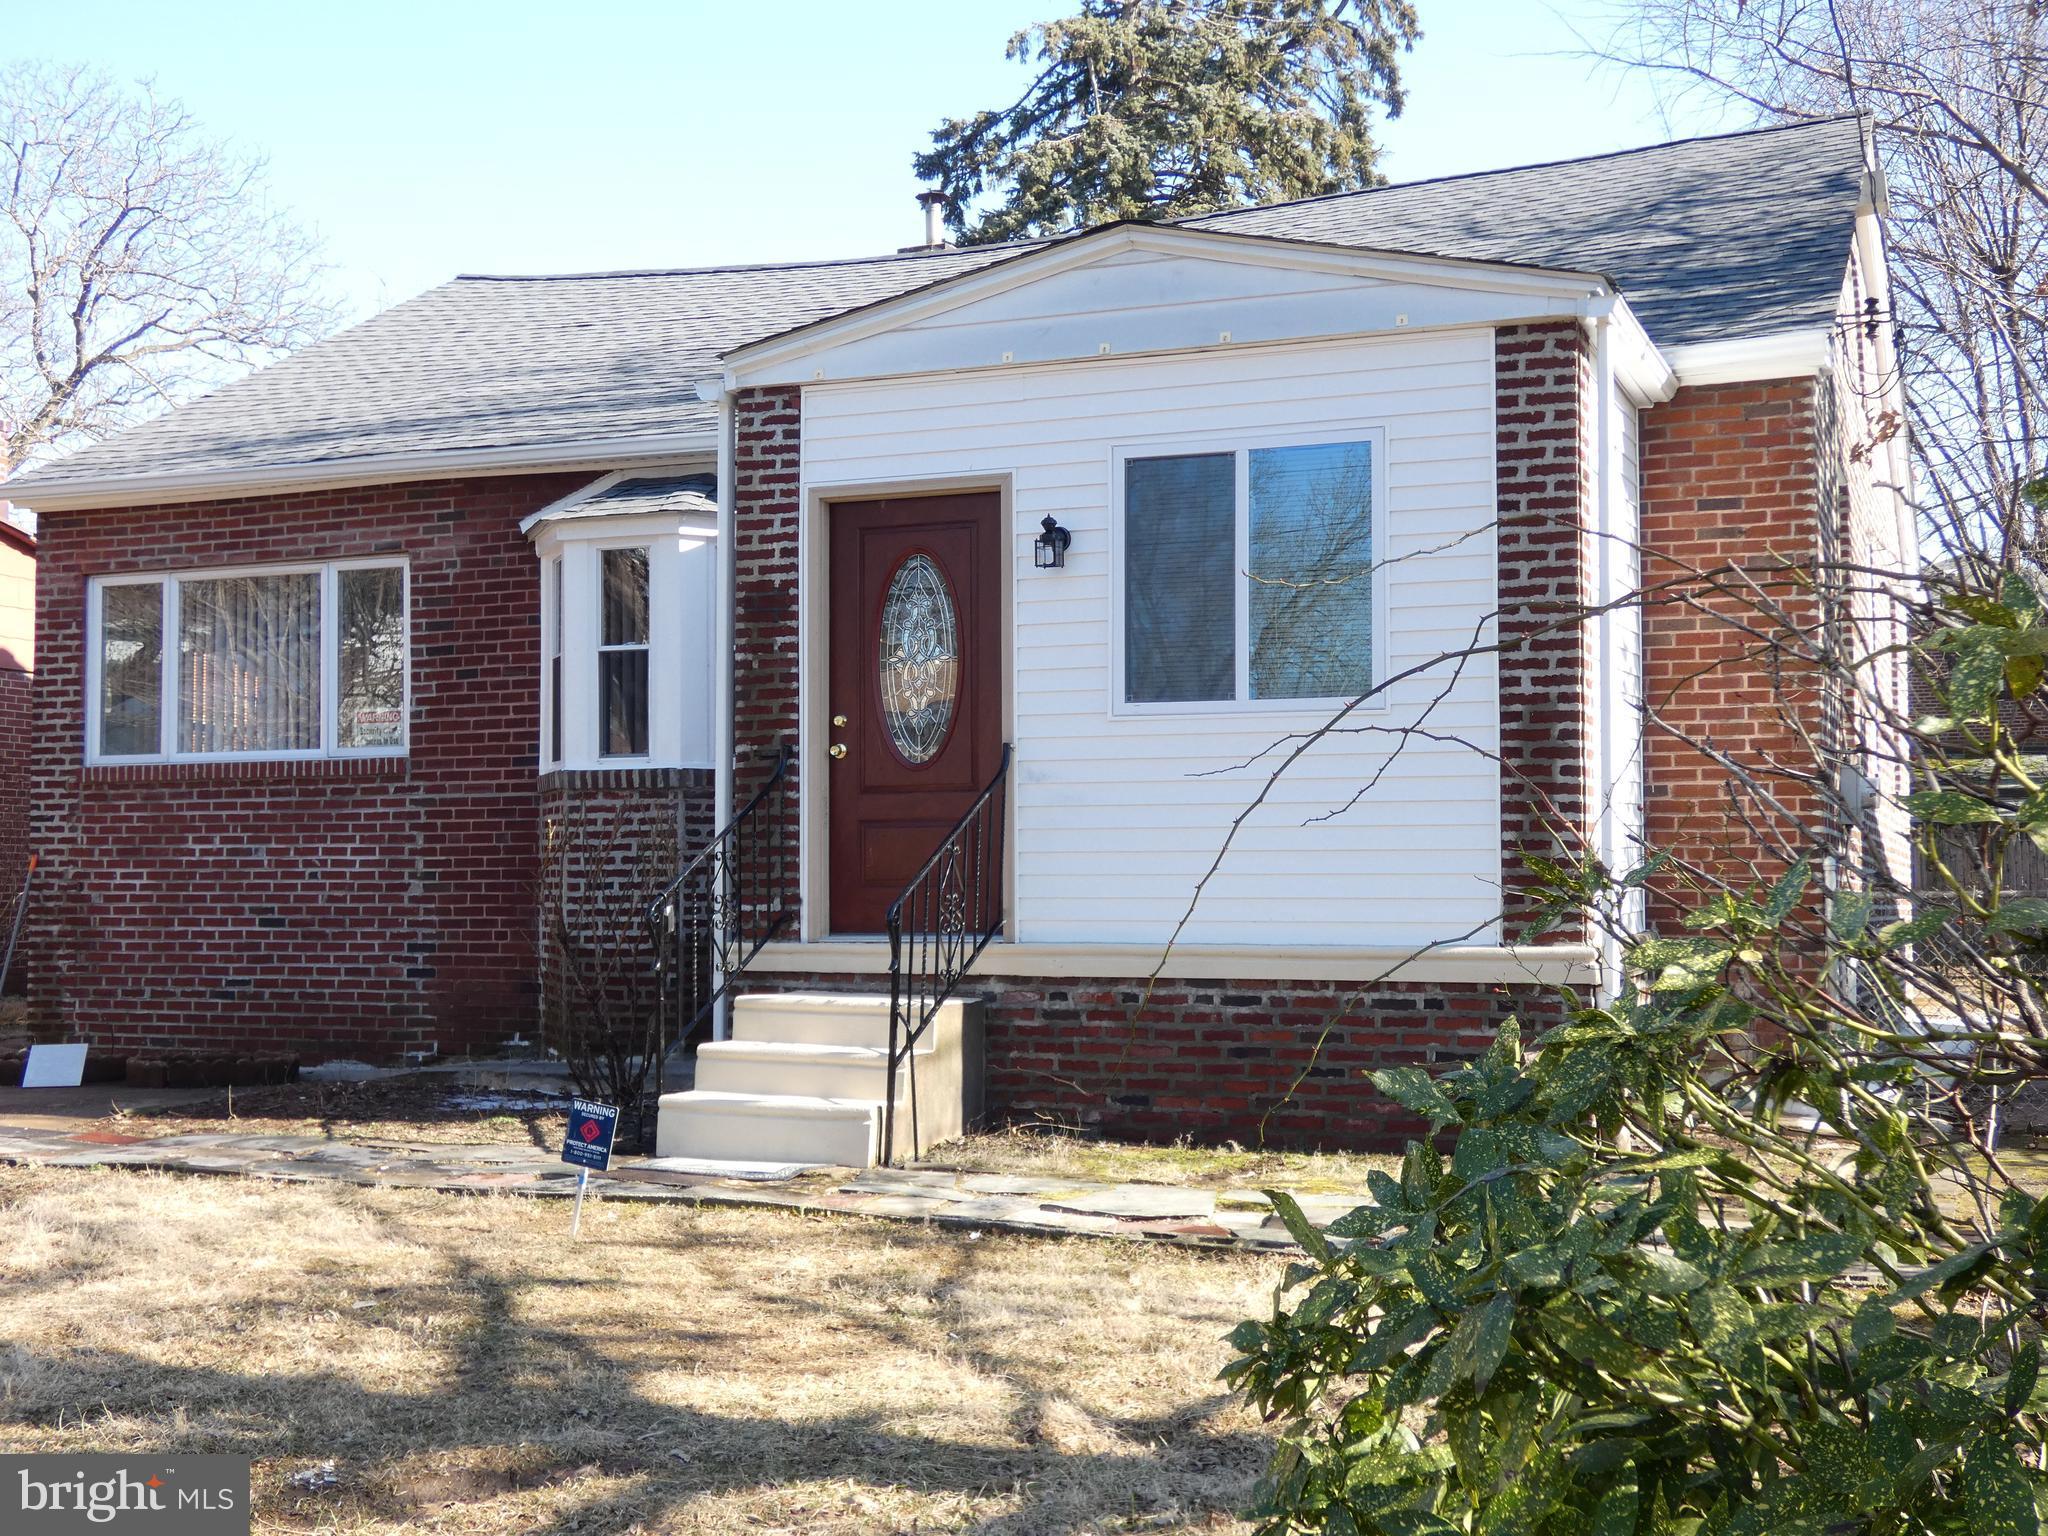 6511 N 3RD STREET, PHILADELPHIA, PA 19126